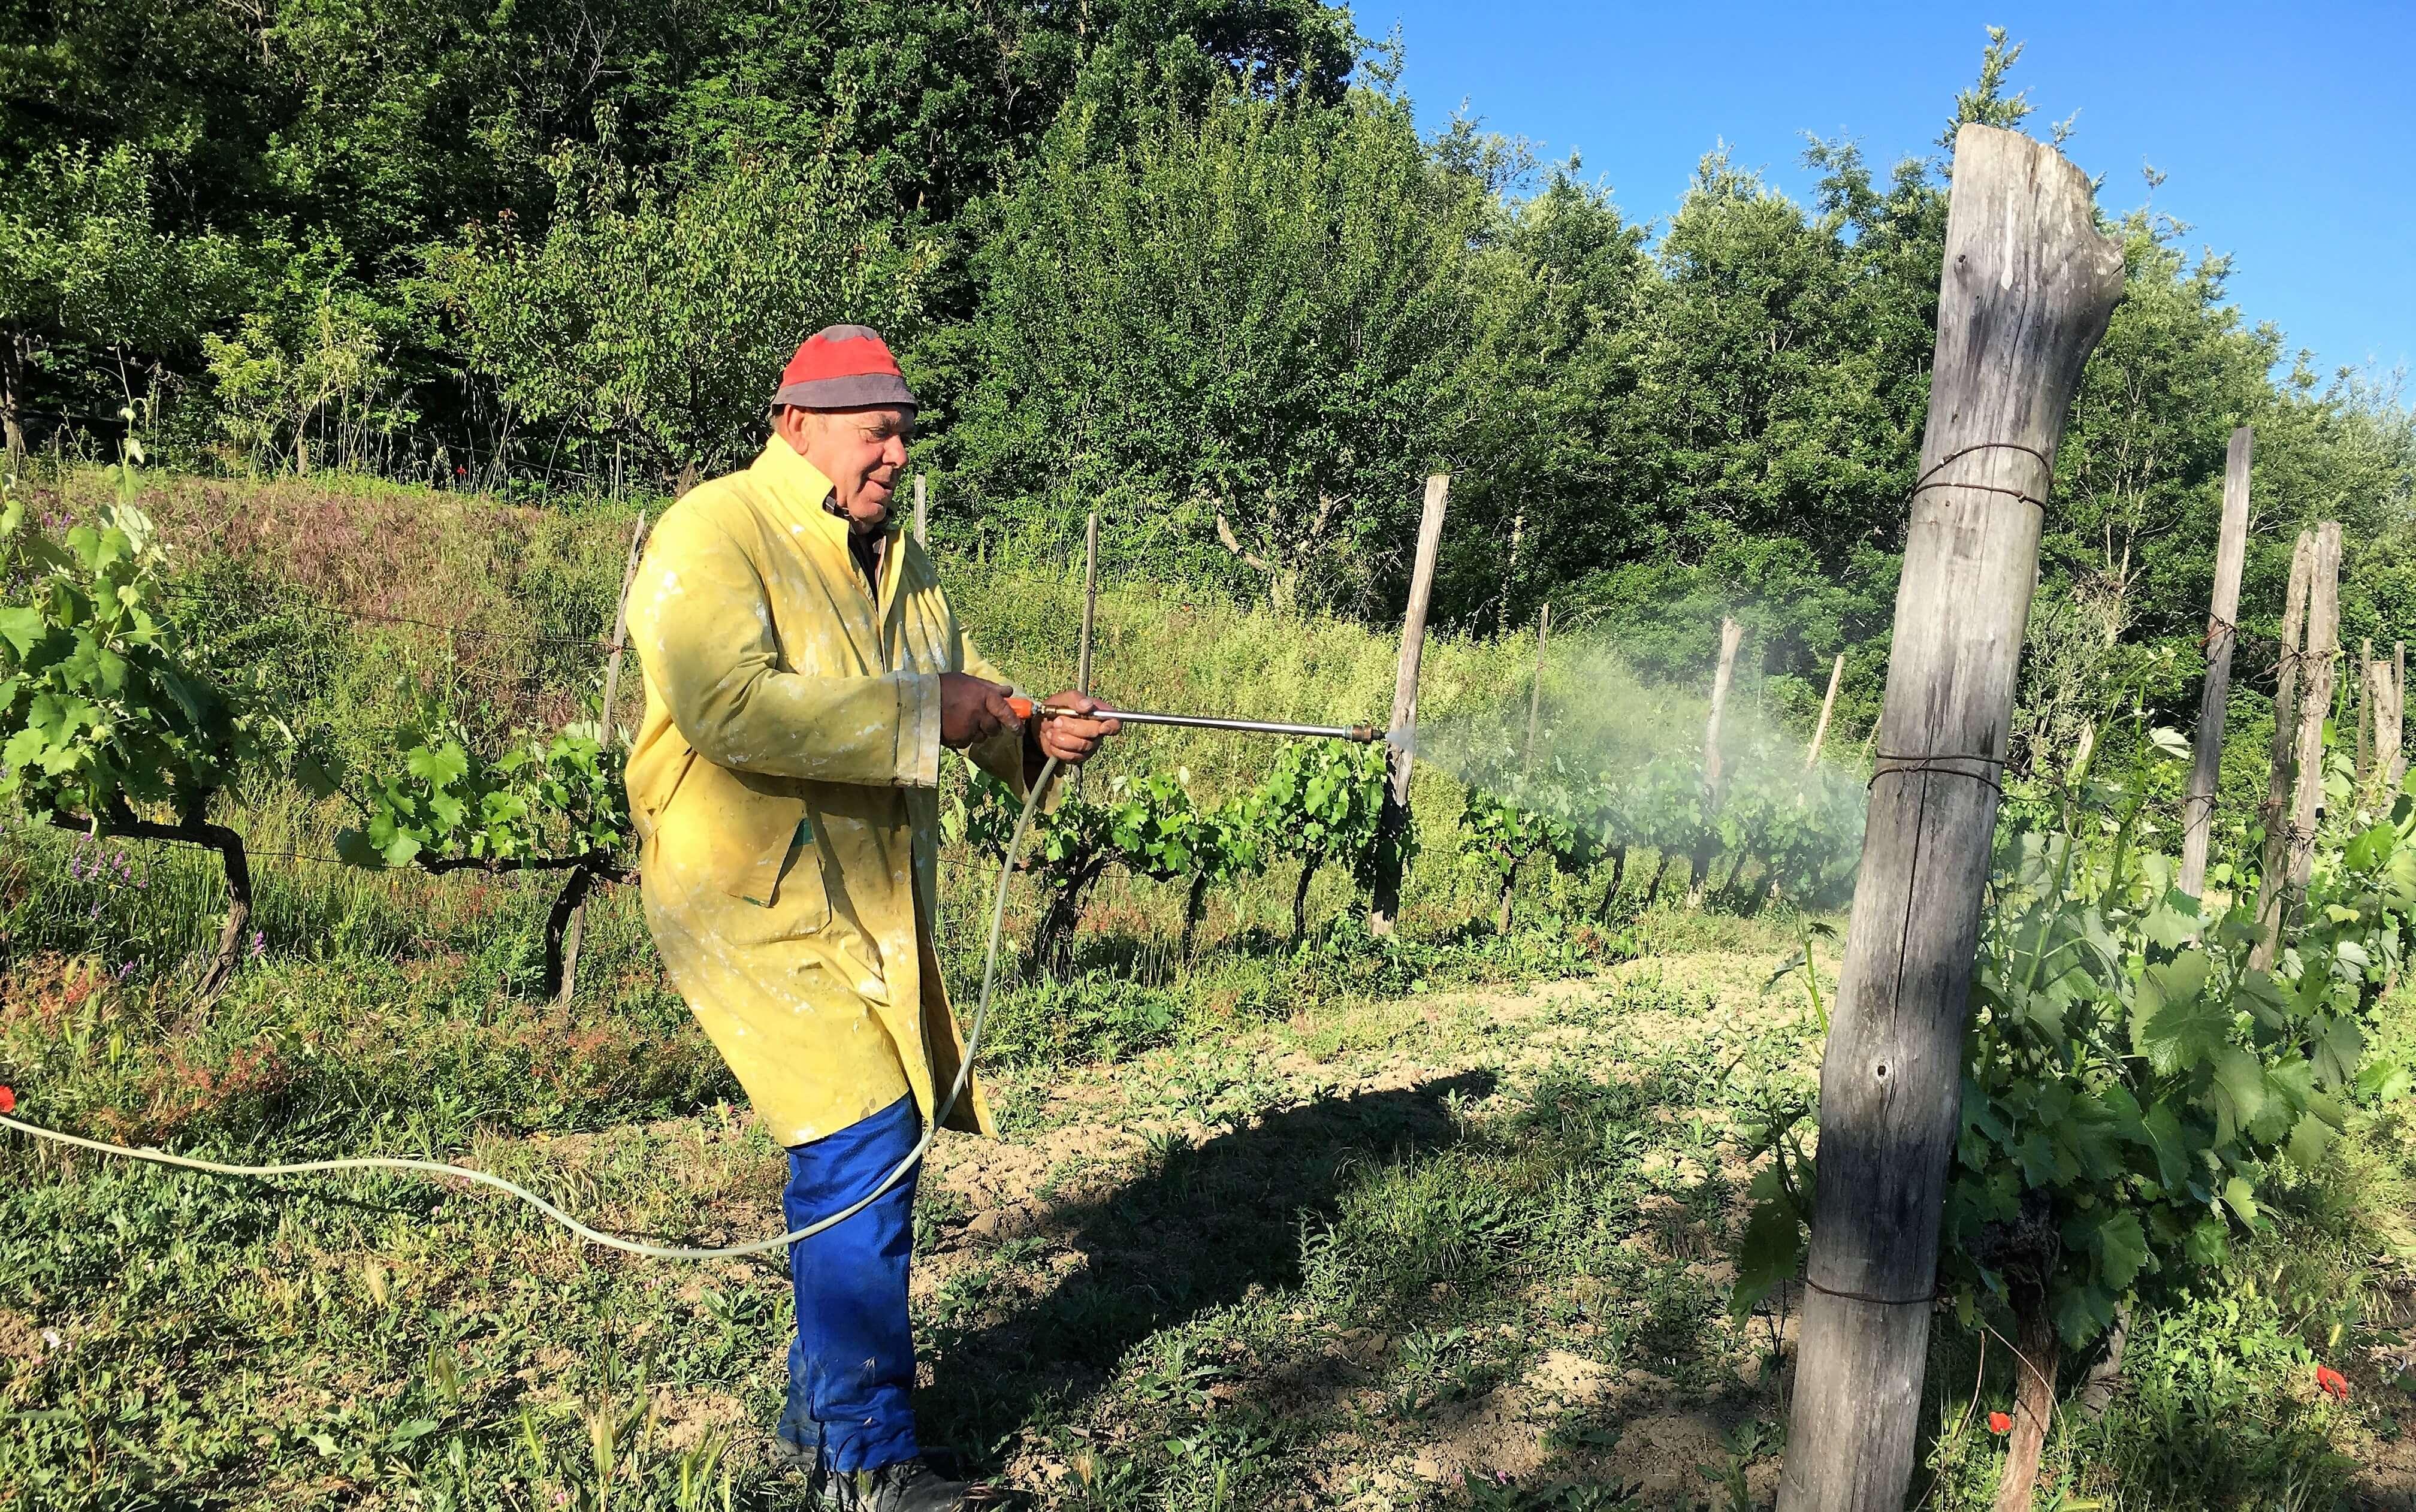 druer-sprøytes-vingård